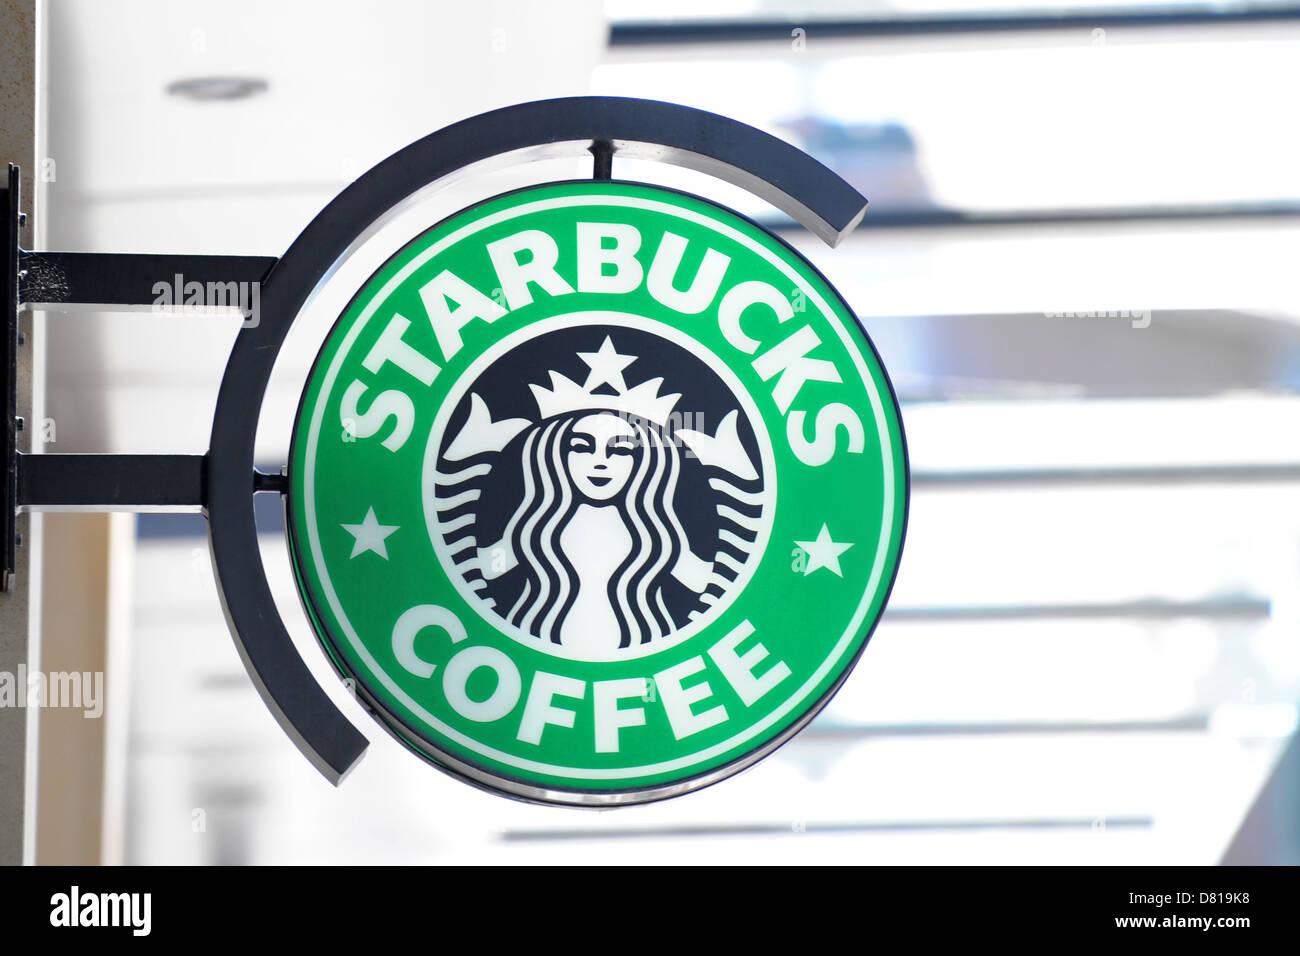 Starbucks sign in Cardiff. - Stock Image